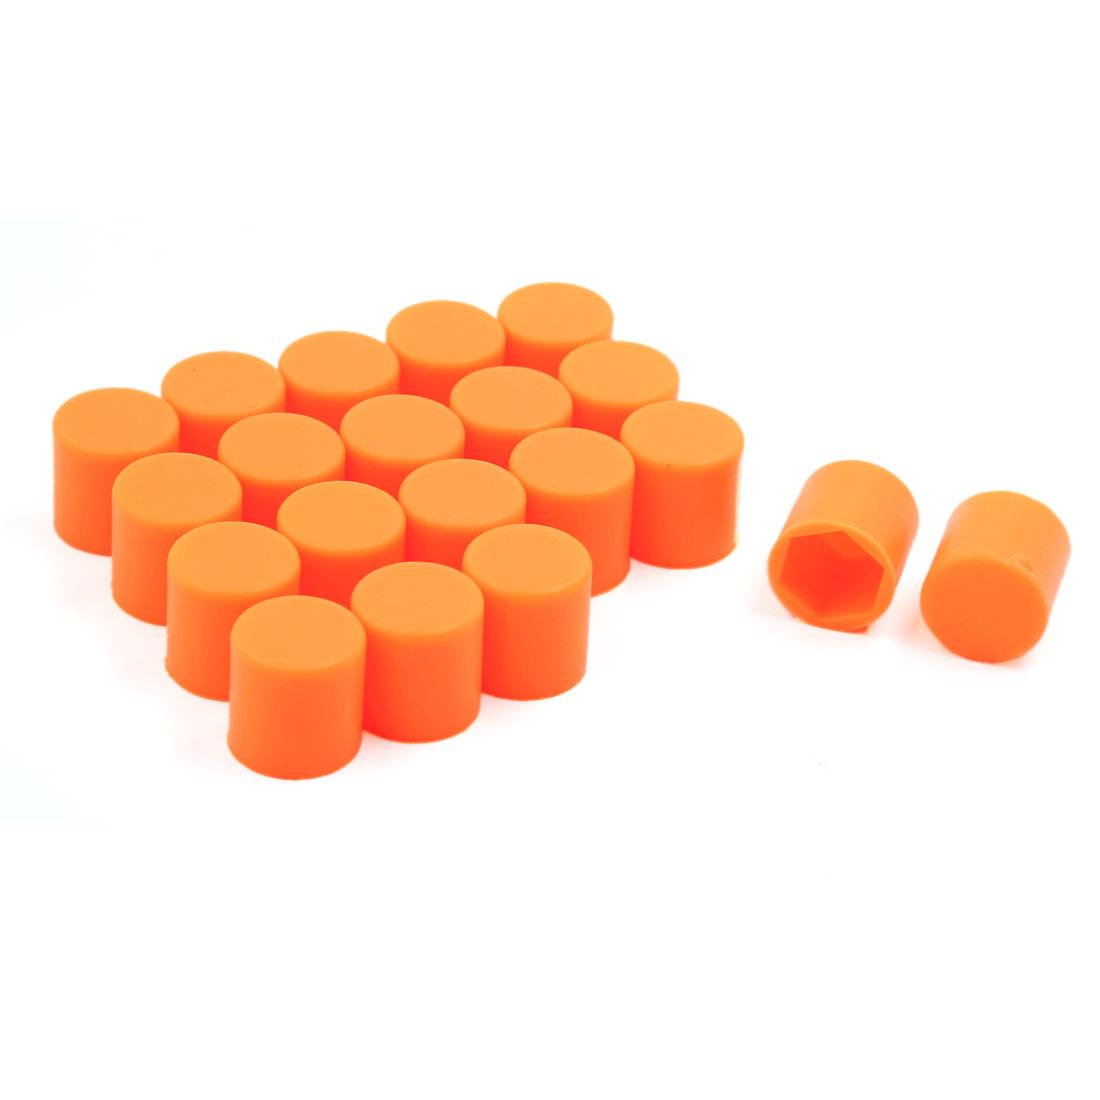 21mm Silicone Car Wheel Lug Nut Bolt Cover Protective Tyre Valve Screw Cap Orange 20 Pcs